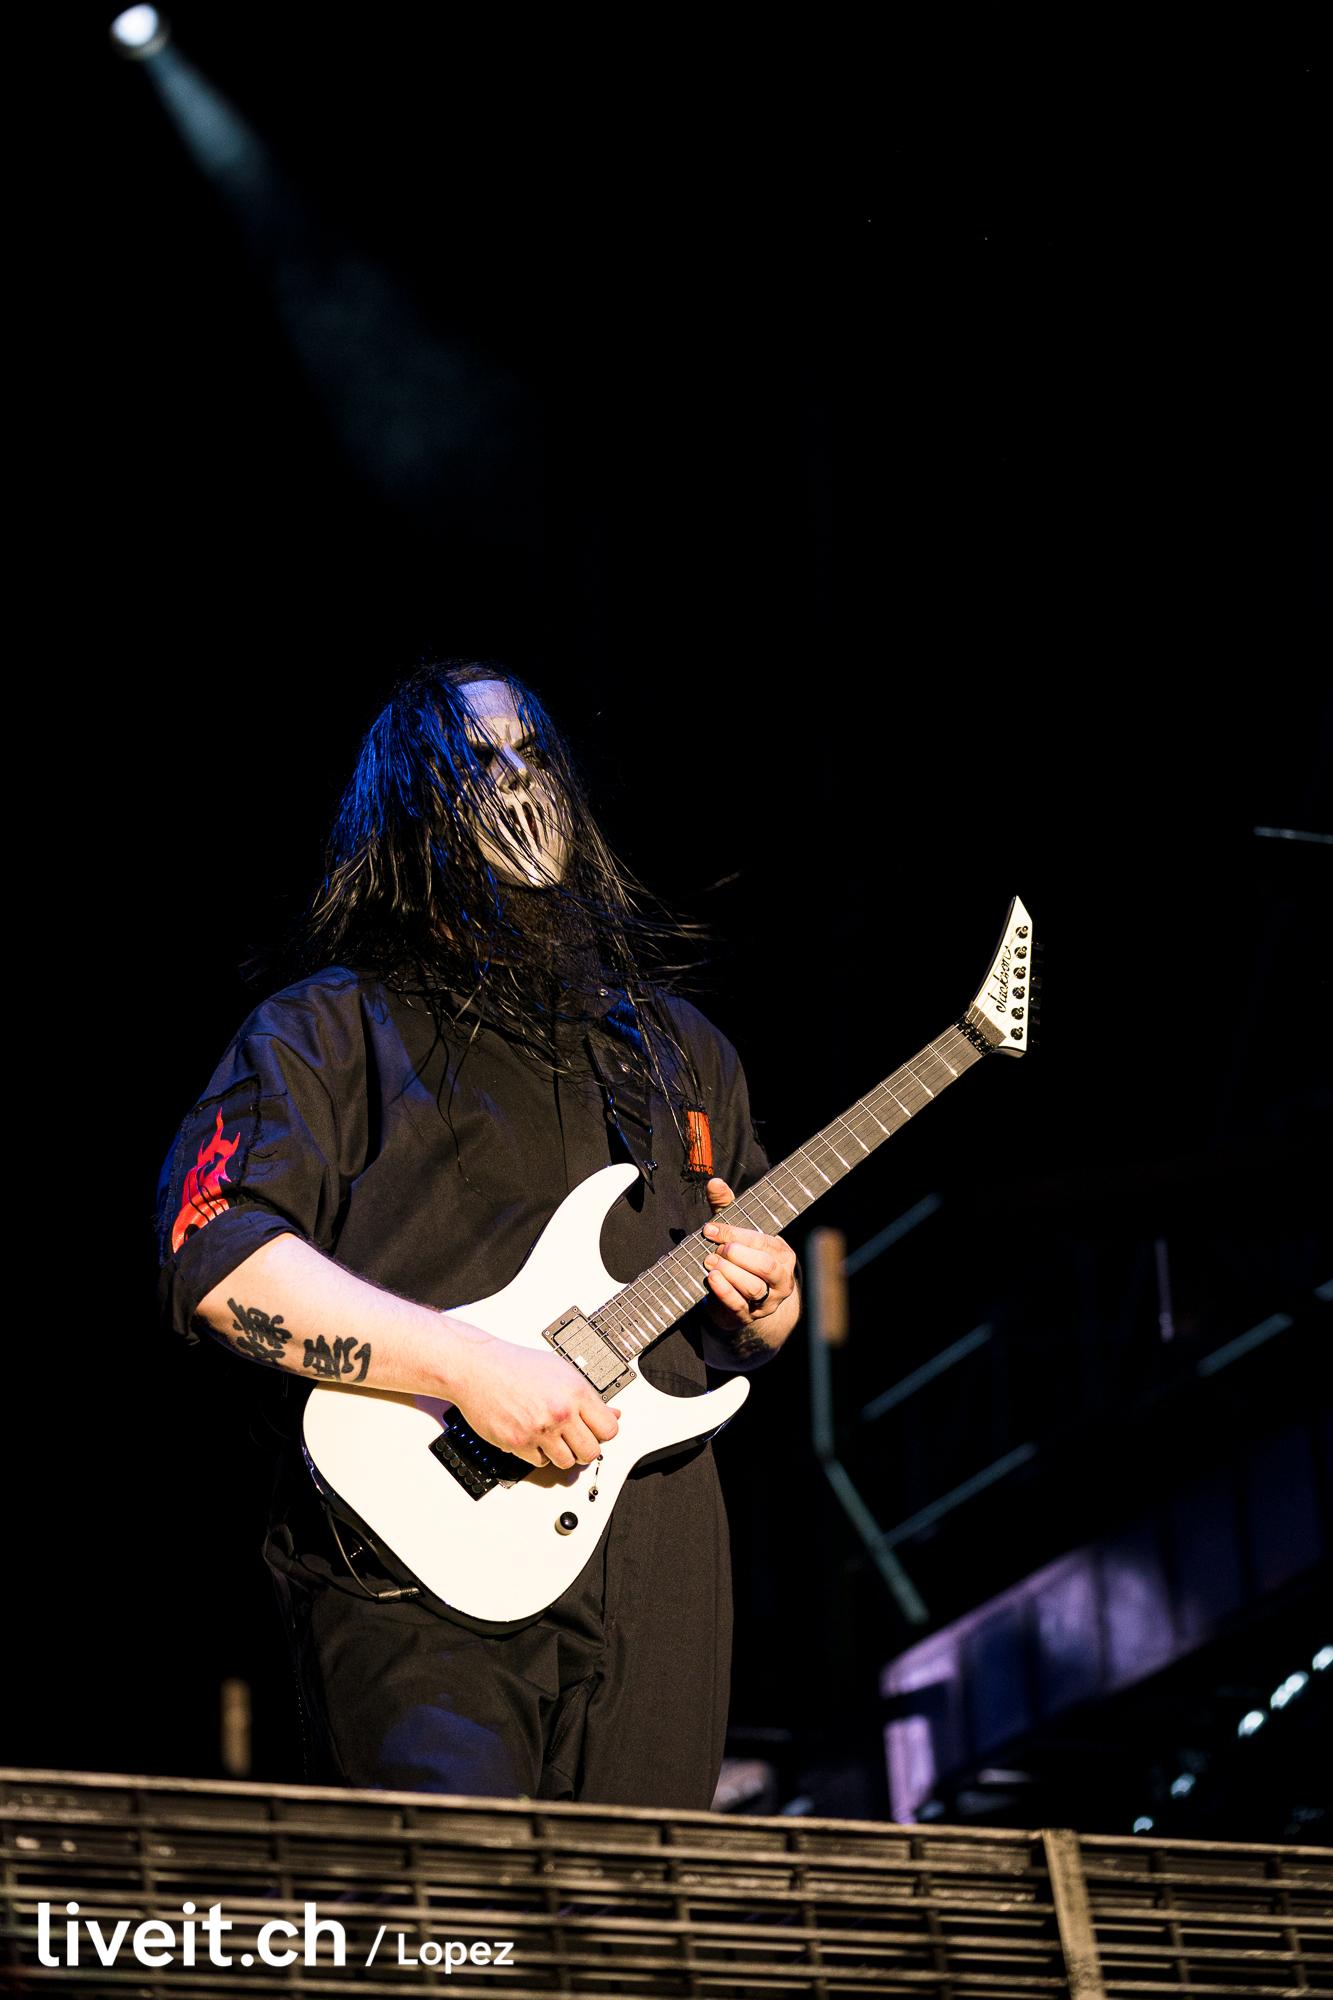 SCHWEIZ GREENFIELD FESTIVAL 2019 Slipknot